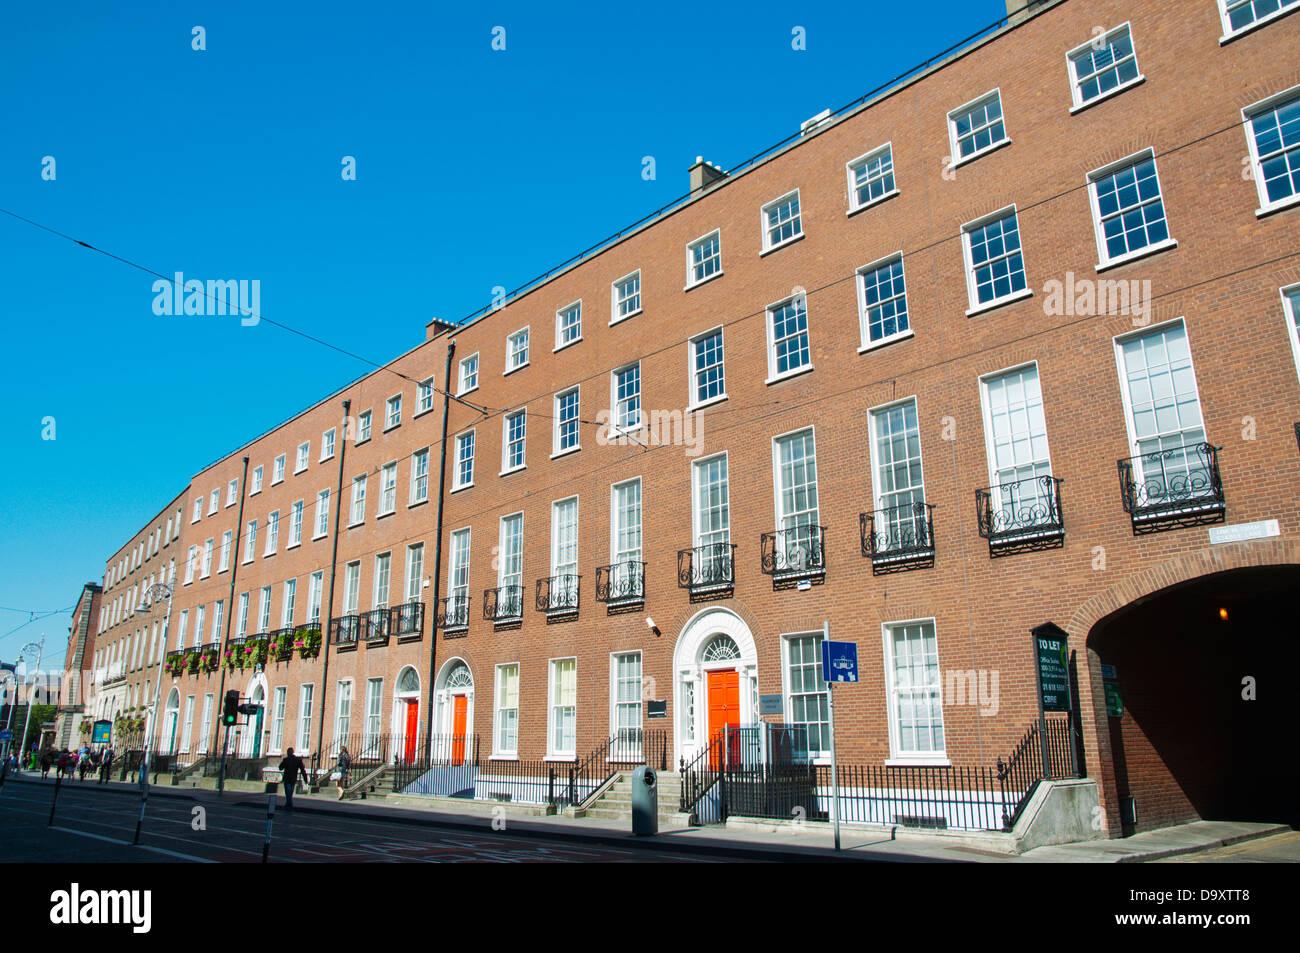 Georgian architecture along Harcourt Street central Dublin Ireland Europe - Stock Image